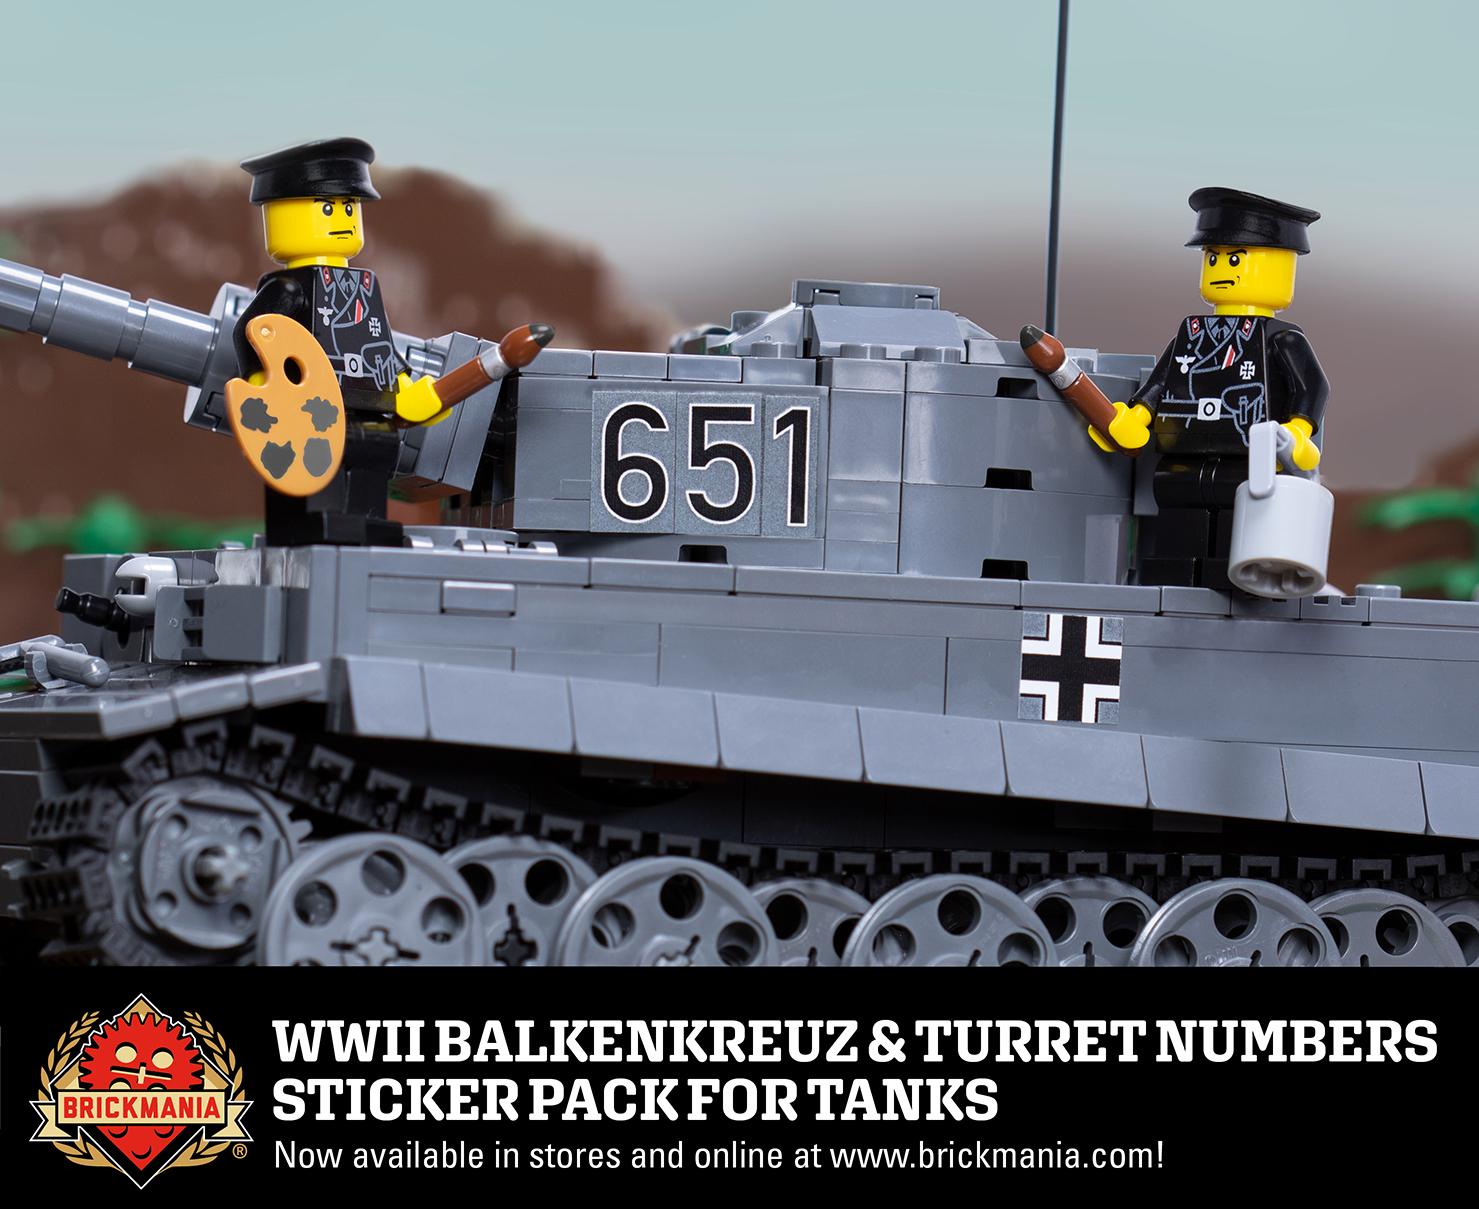 WWII Balkenkreuz & Turret Numbers - Sticker Pack